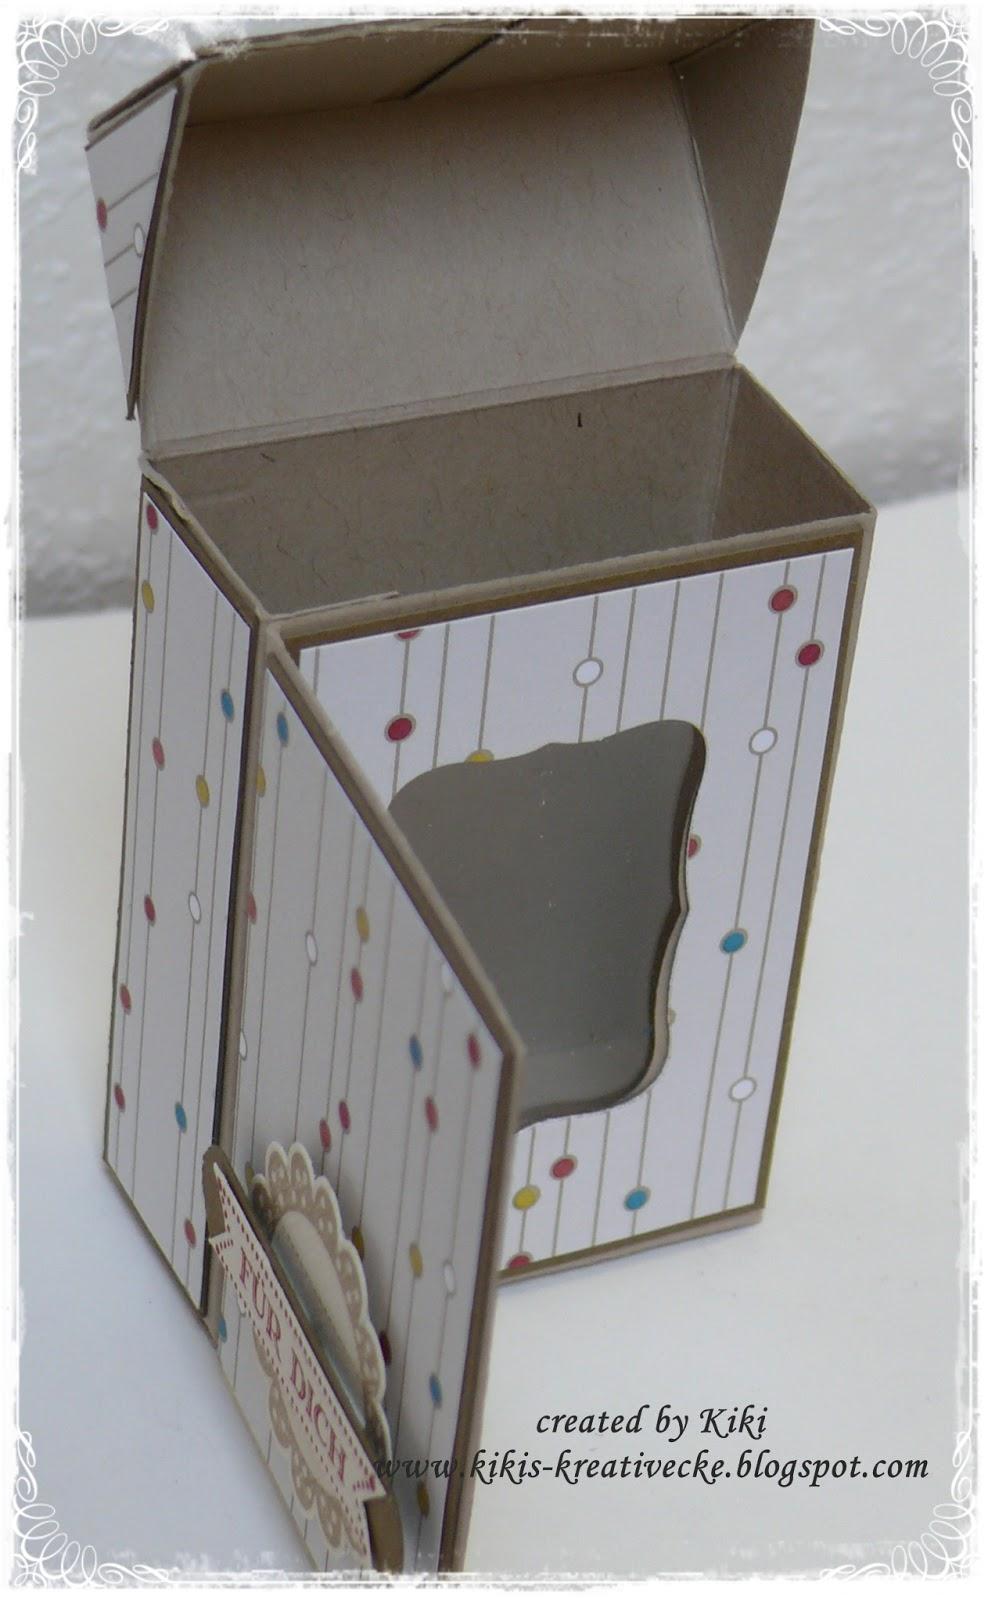 kiki 39 s kreativ ecke flip top box. Black Bedroom Furniture Sets. Home Design Ideas